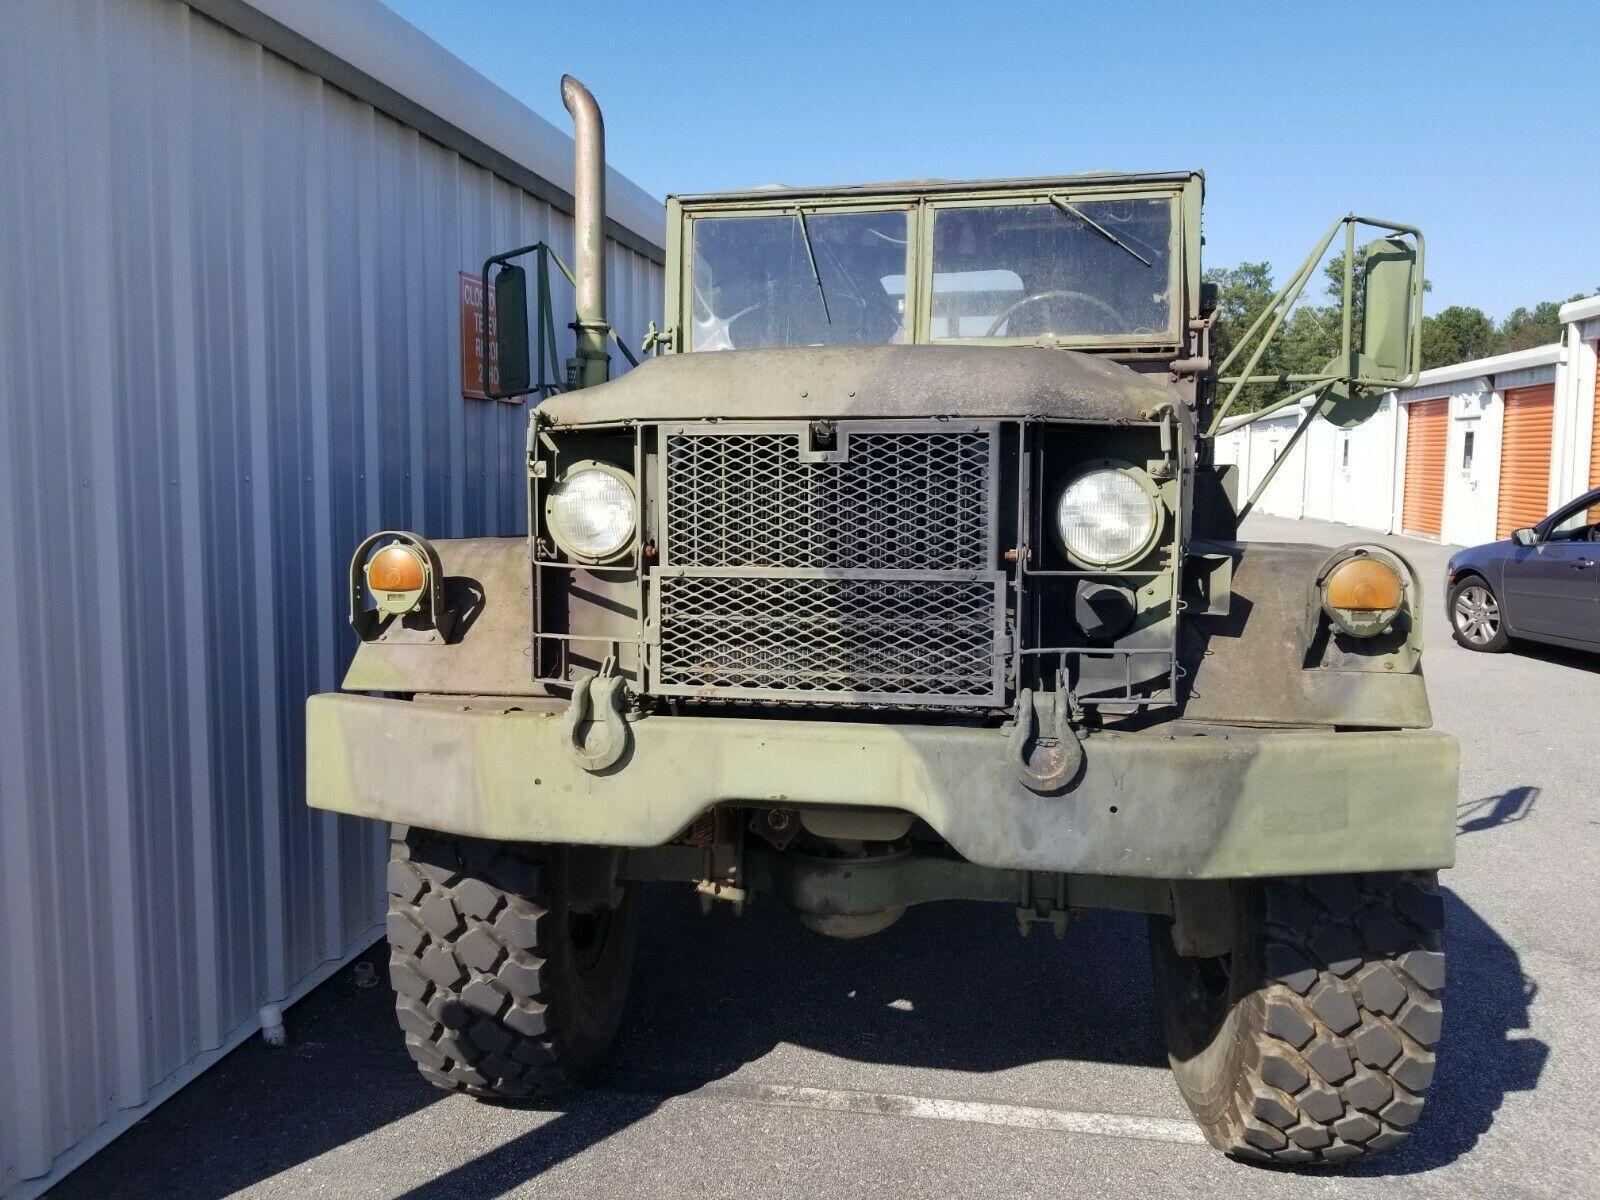 Bobbed Deuce 1987 AM General M35a2 Military